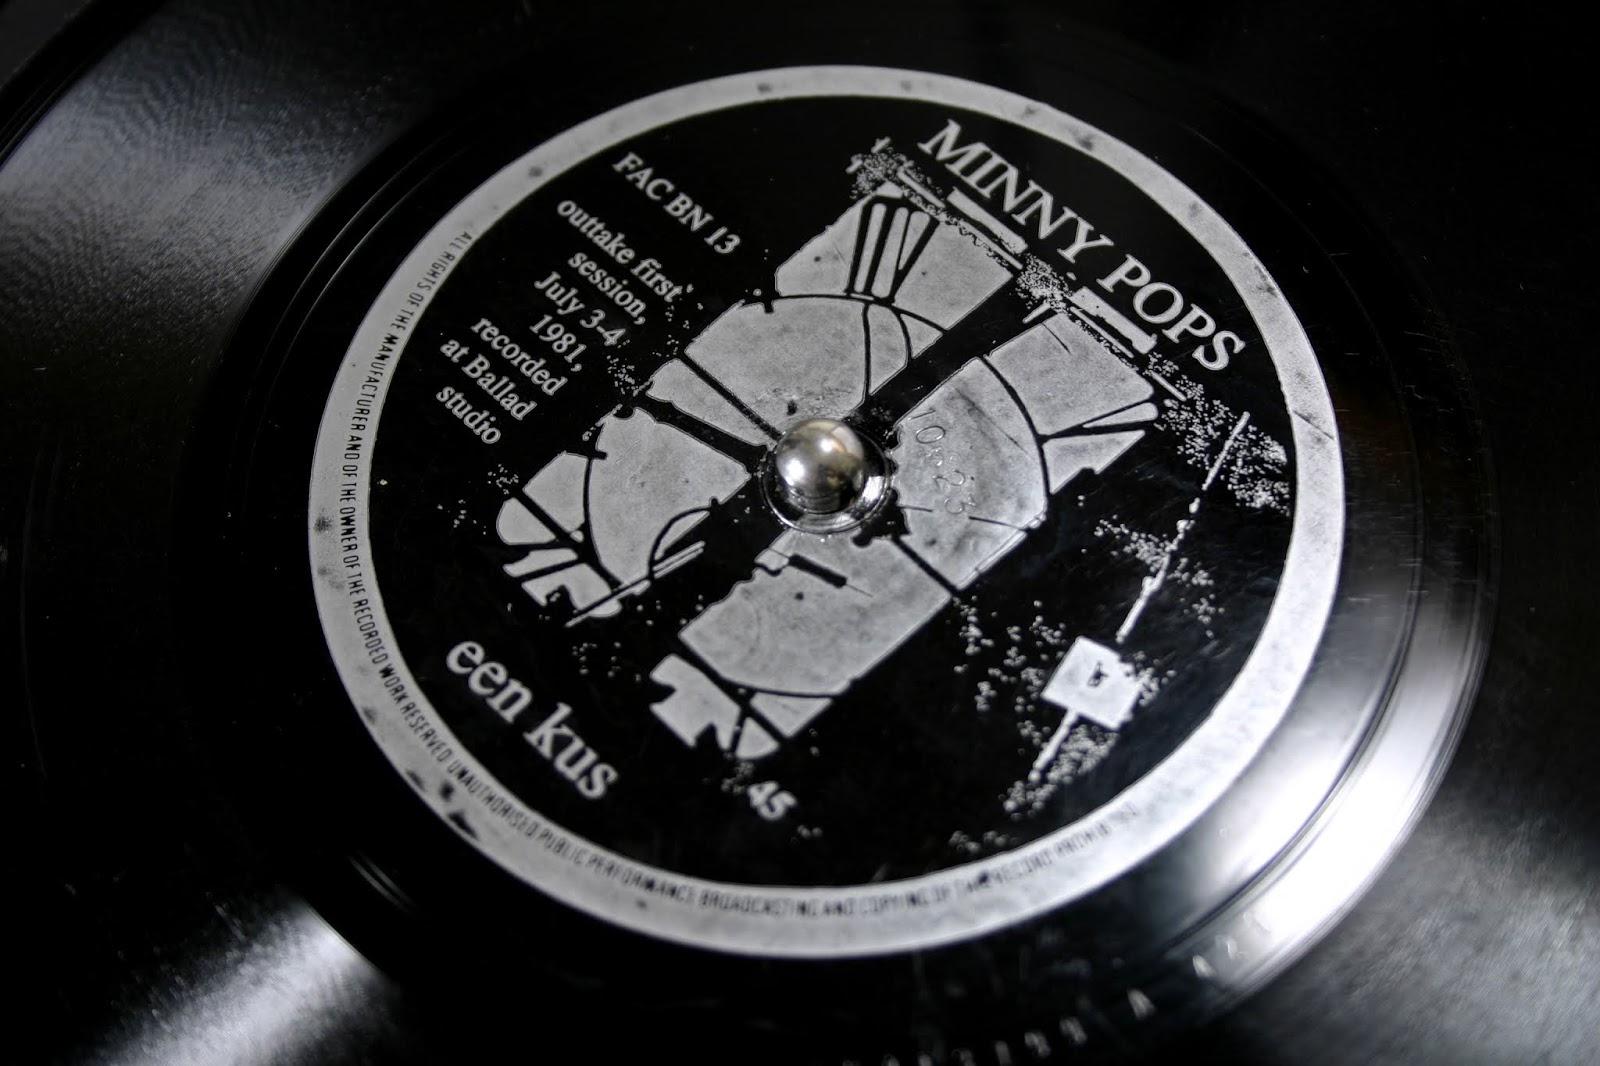 'Vinyl' magazine flexi-disc [Factory Benelux FAC BN 13, Vinyl Magazine 8]